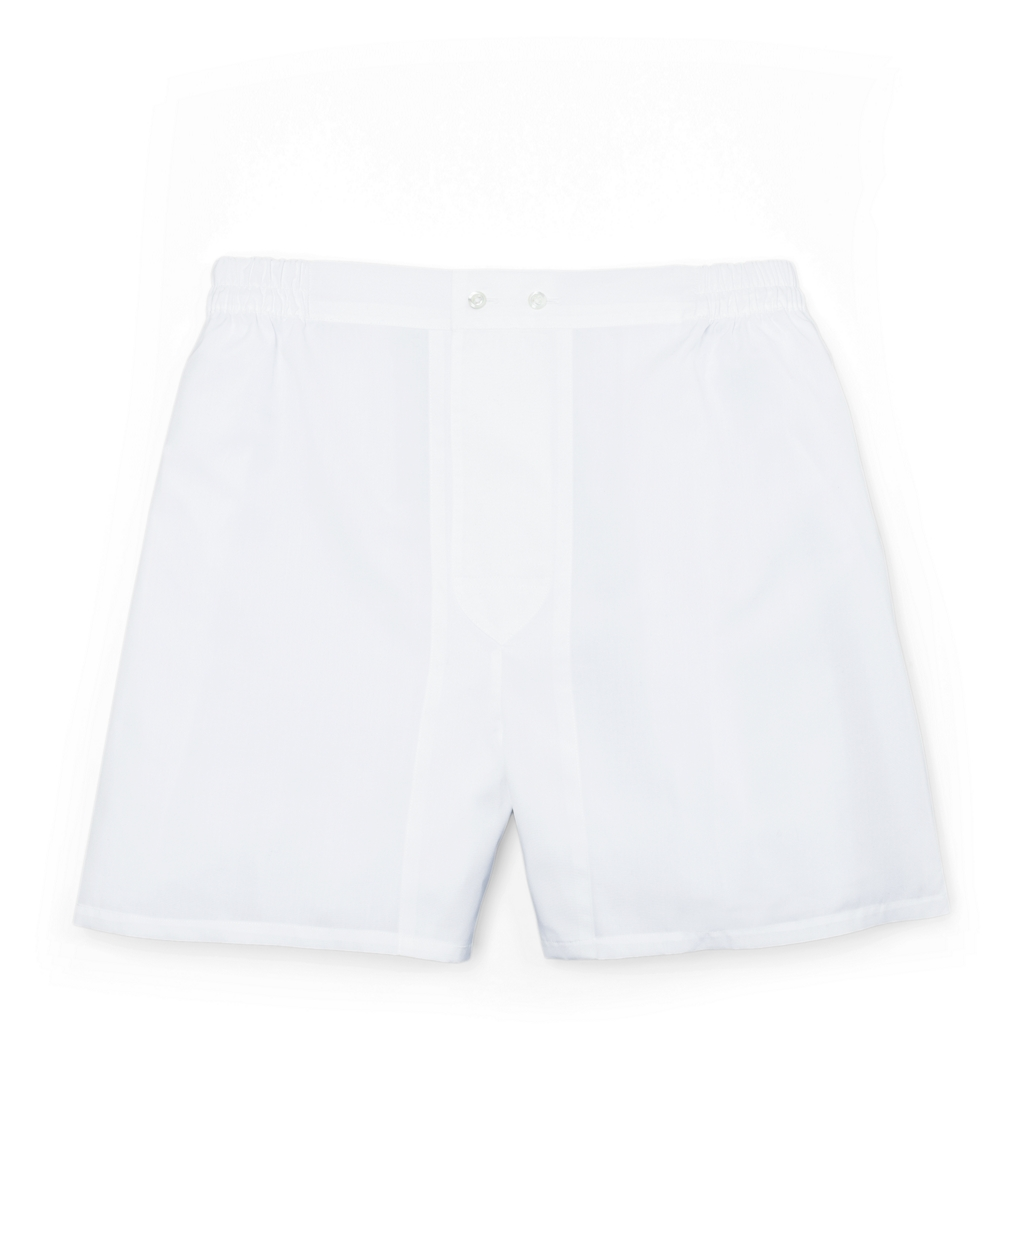 Vintage Men's Underwear Brooks Brothers Mens Luxury Boxers $45.00 AT vintagedancer.com